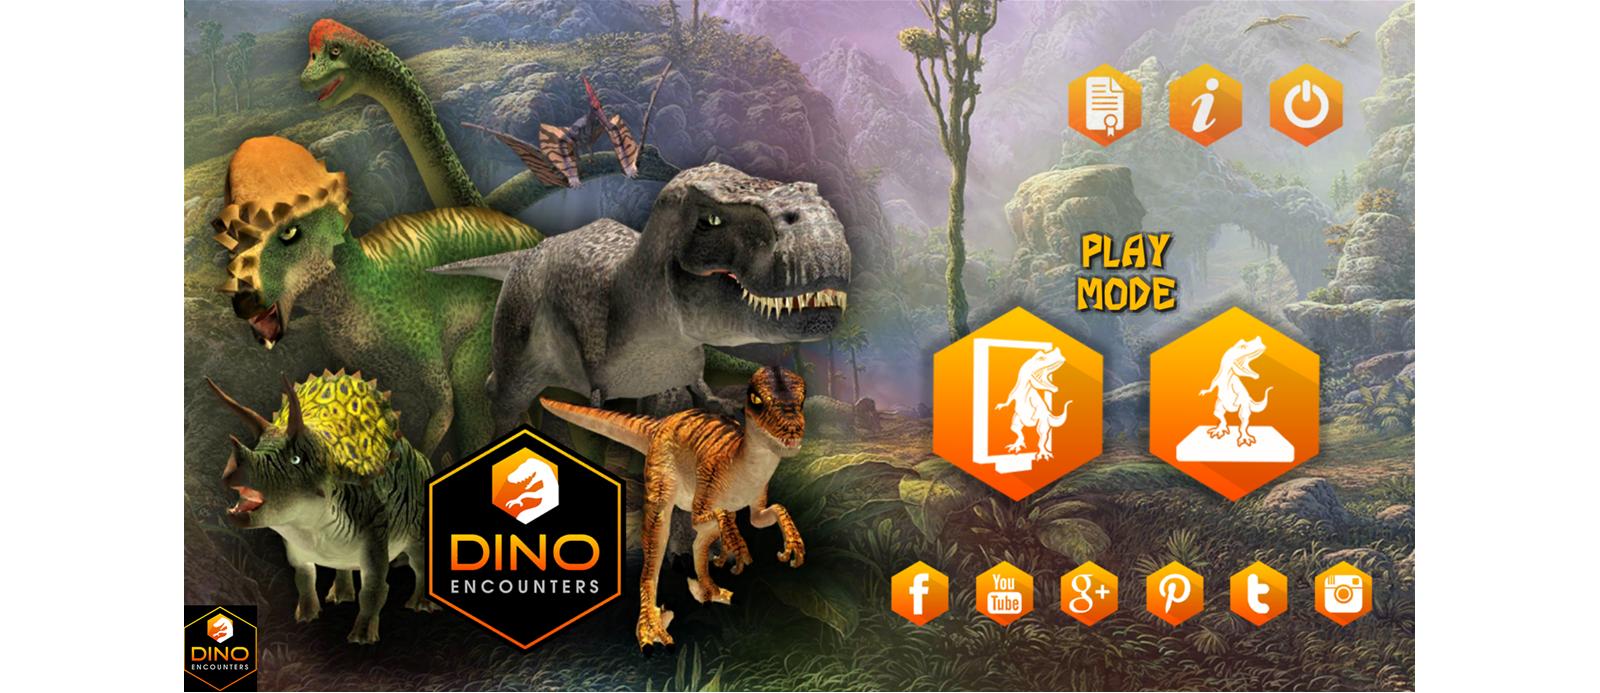 DinoEncounters App